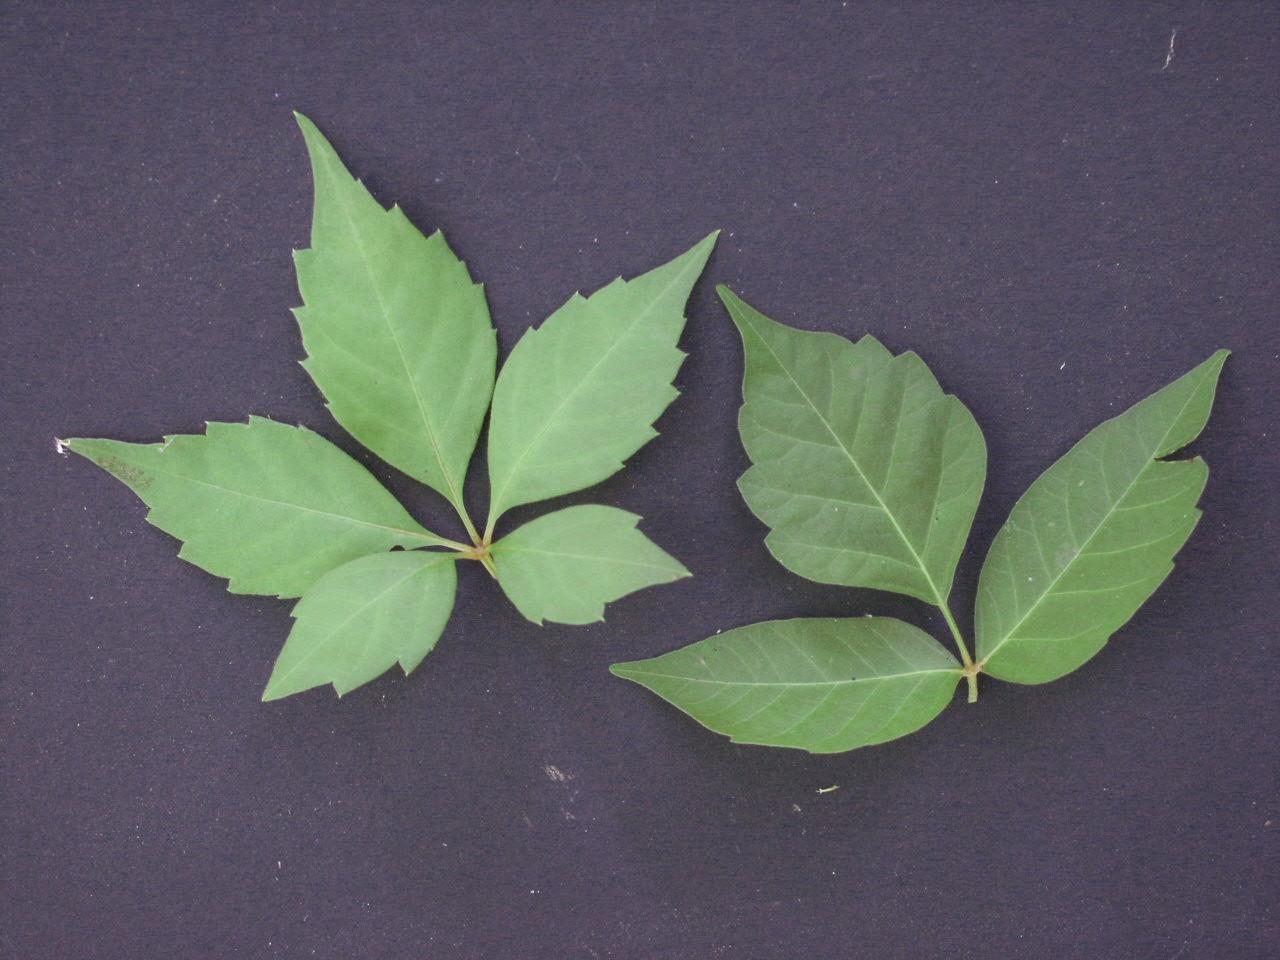 poison ivy virginia creeper